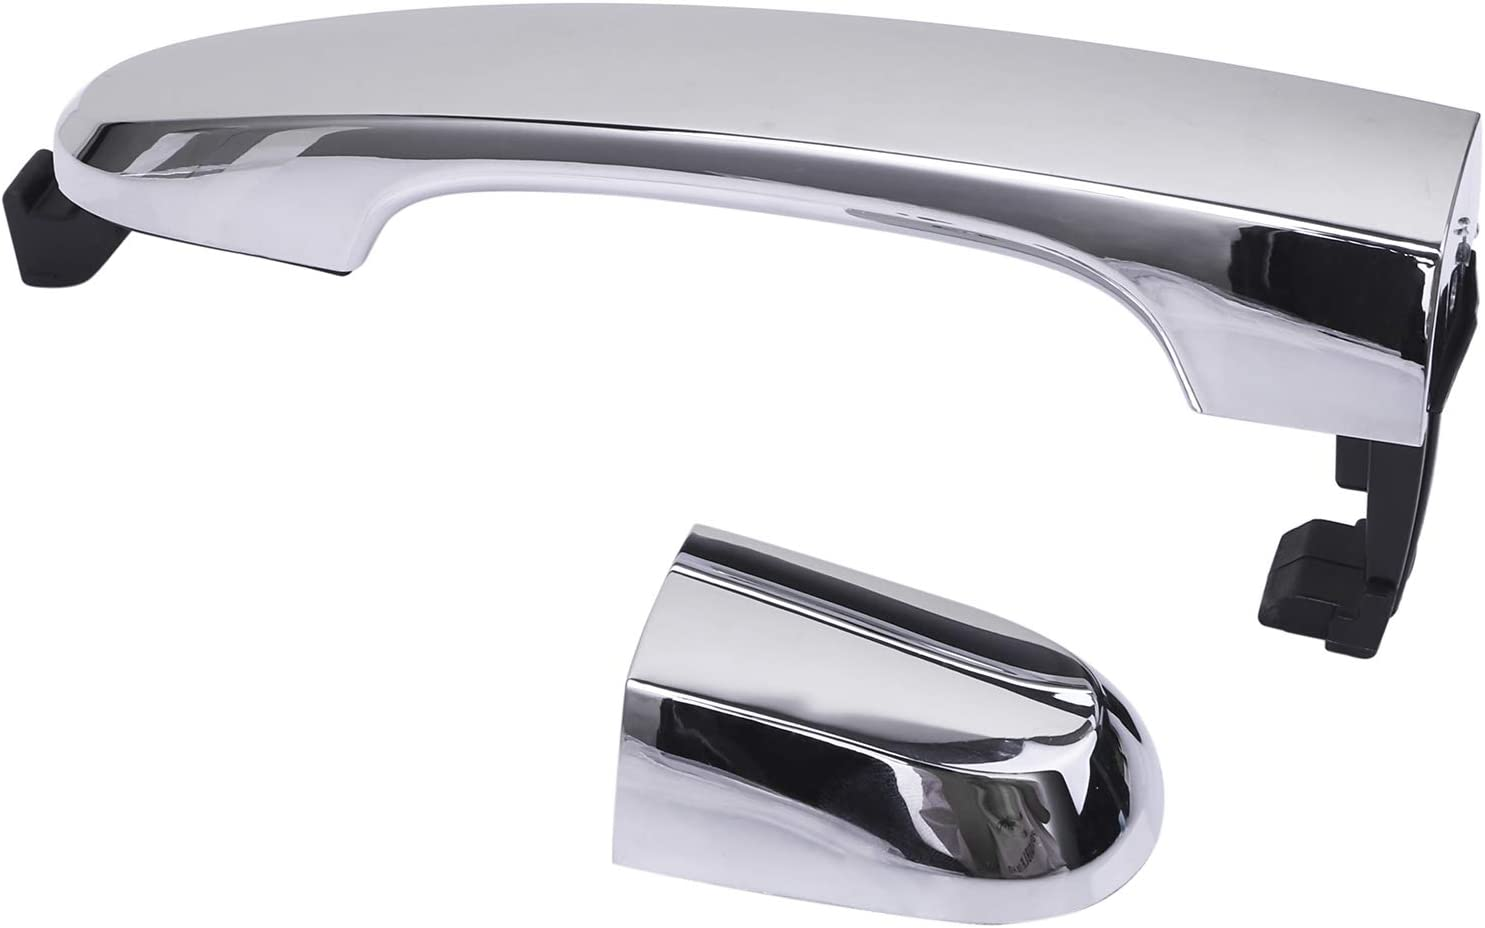 Exterior Rear Right Passenger Side Chrome Door Handle Replacements for Kia Sorento 2011-2015,826512P010 836622P010